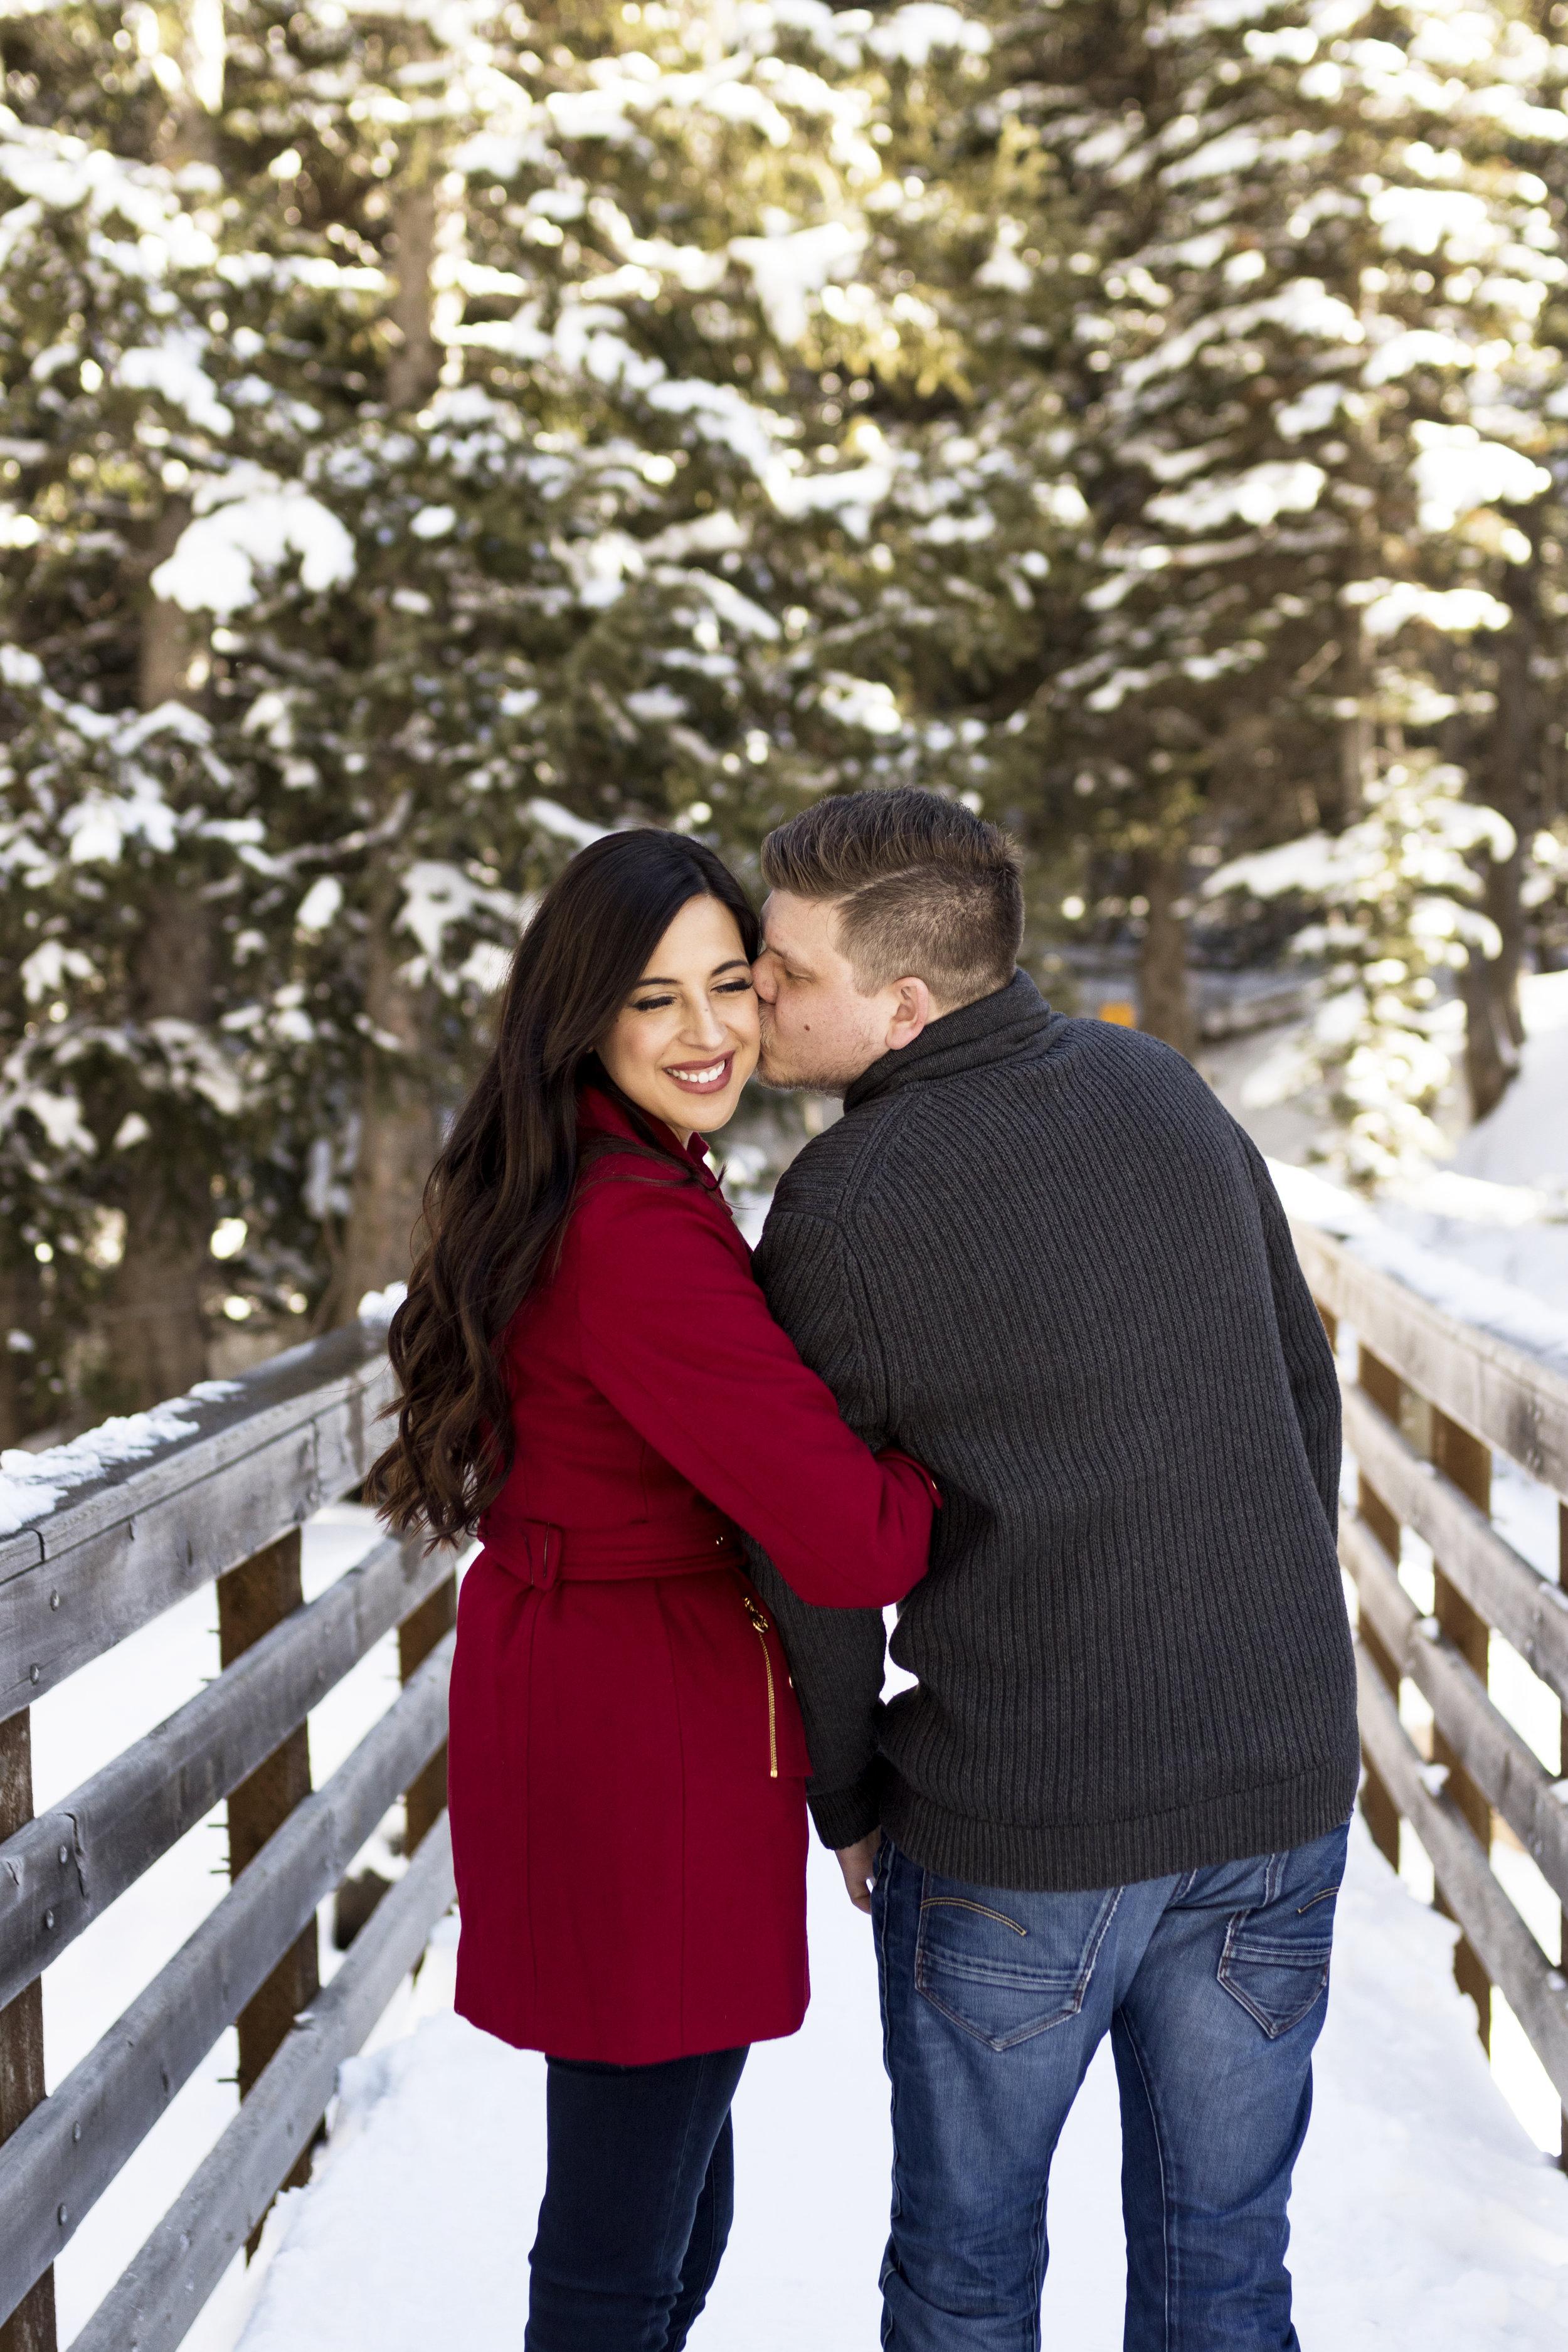 Snowey Utah Winter Engagements in Little Cottonwood Canyon by Bri Bergman Photography02.jpg